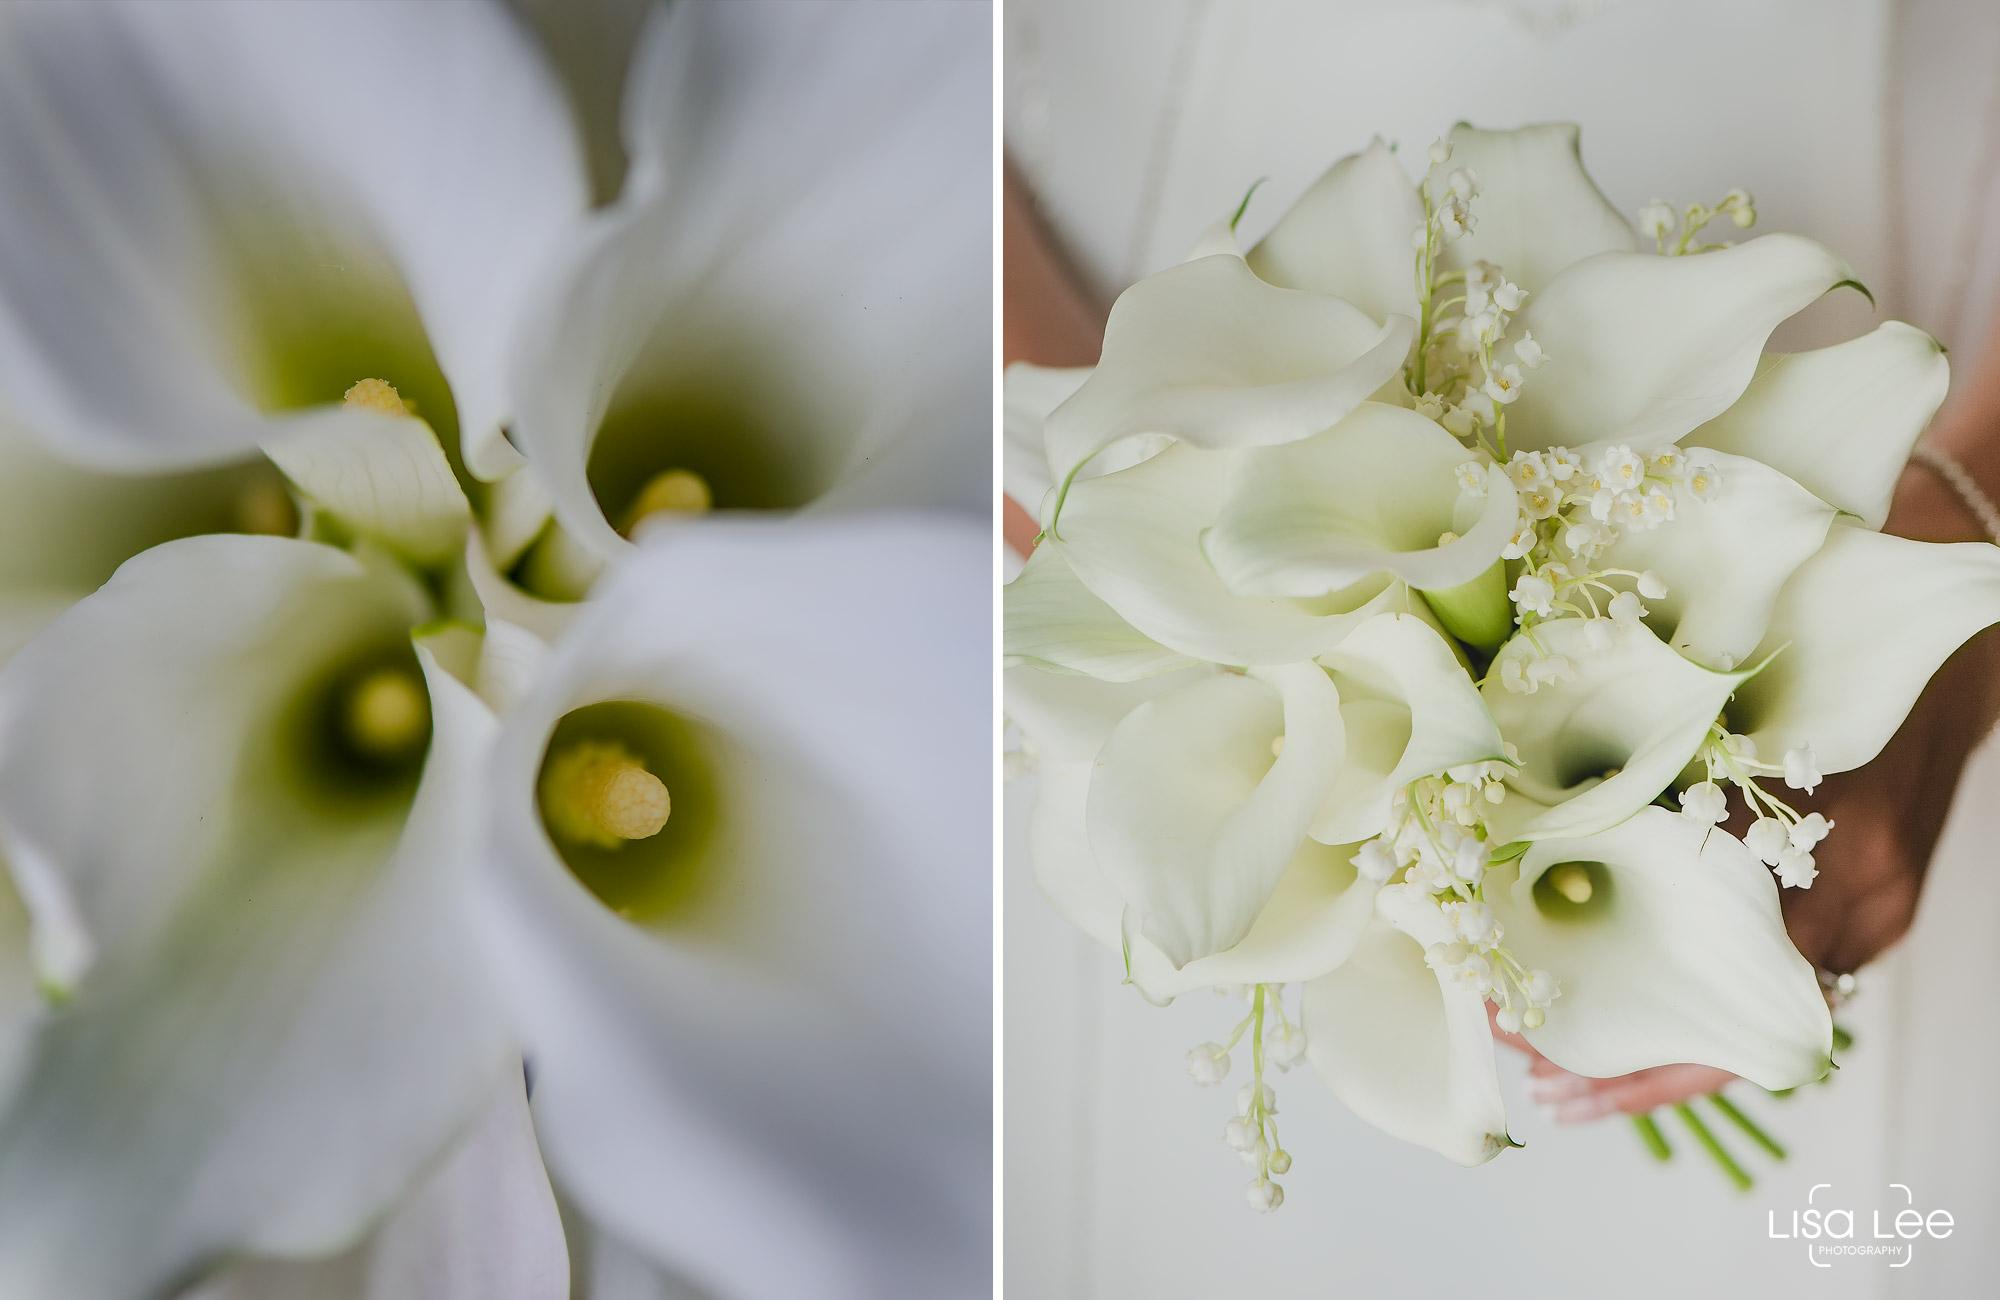 lisa-lee-wedding-photography-christchurch-dorset-flowers3.jpg